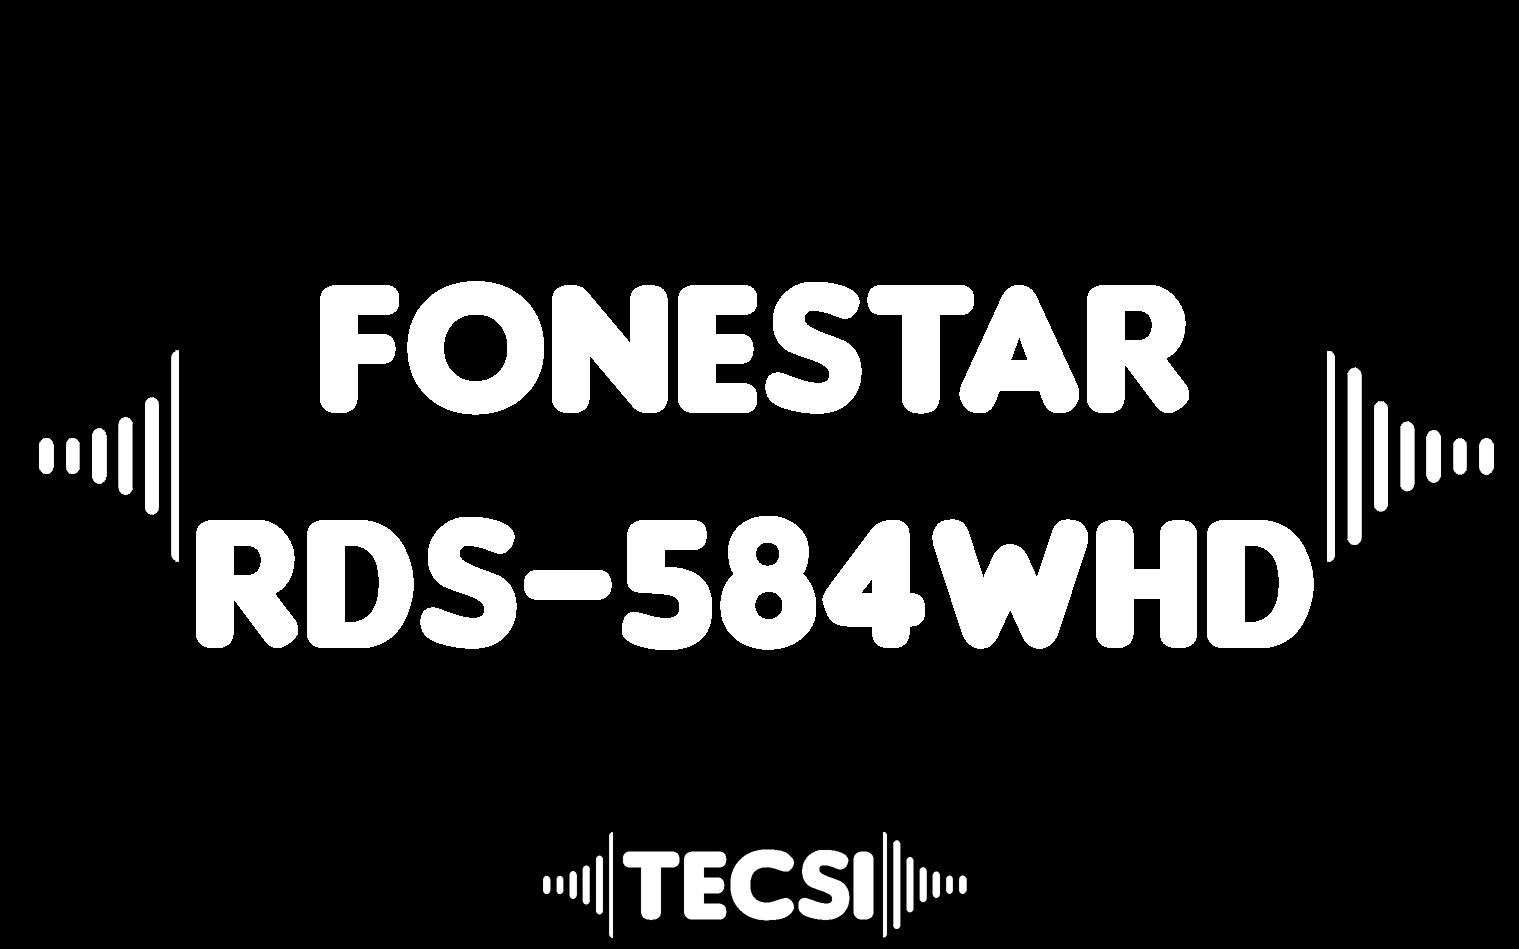 actualizar firmware fonestar 584 whd 2019